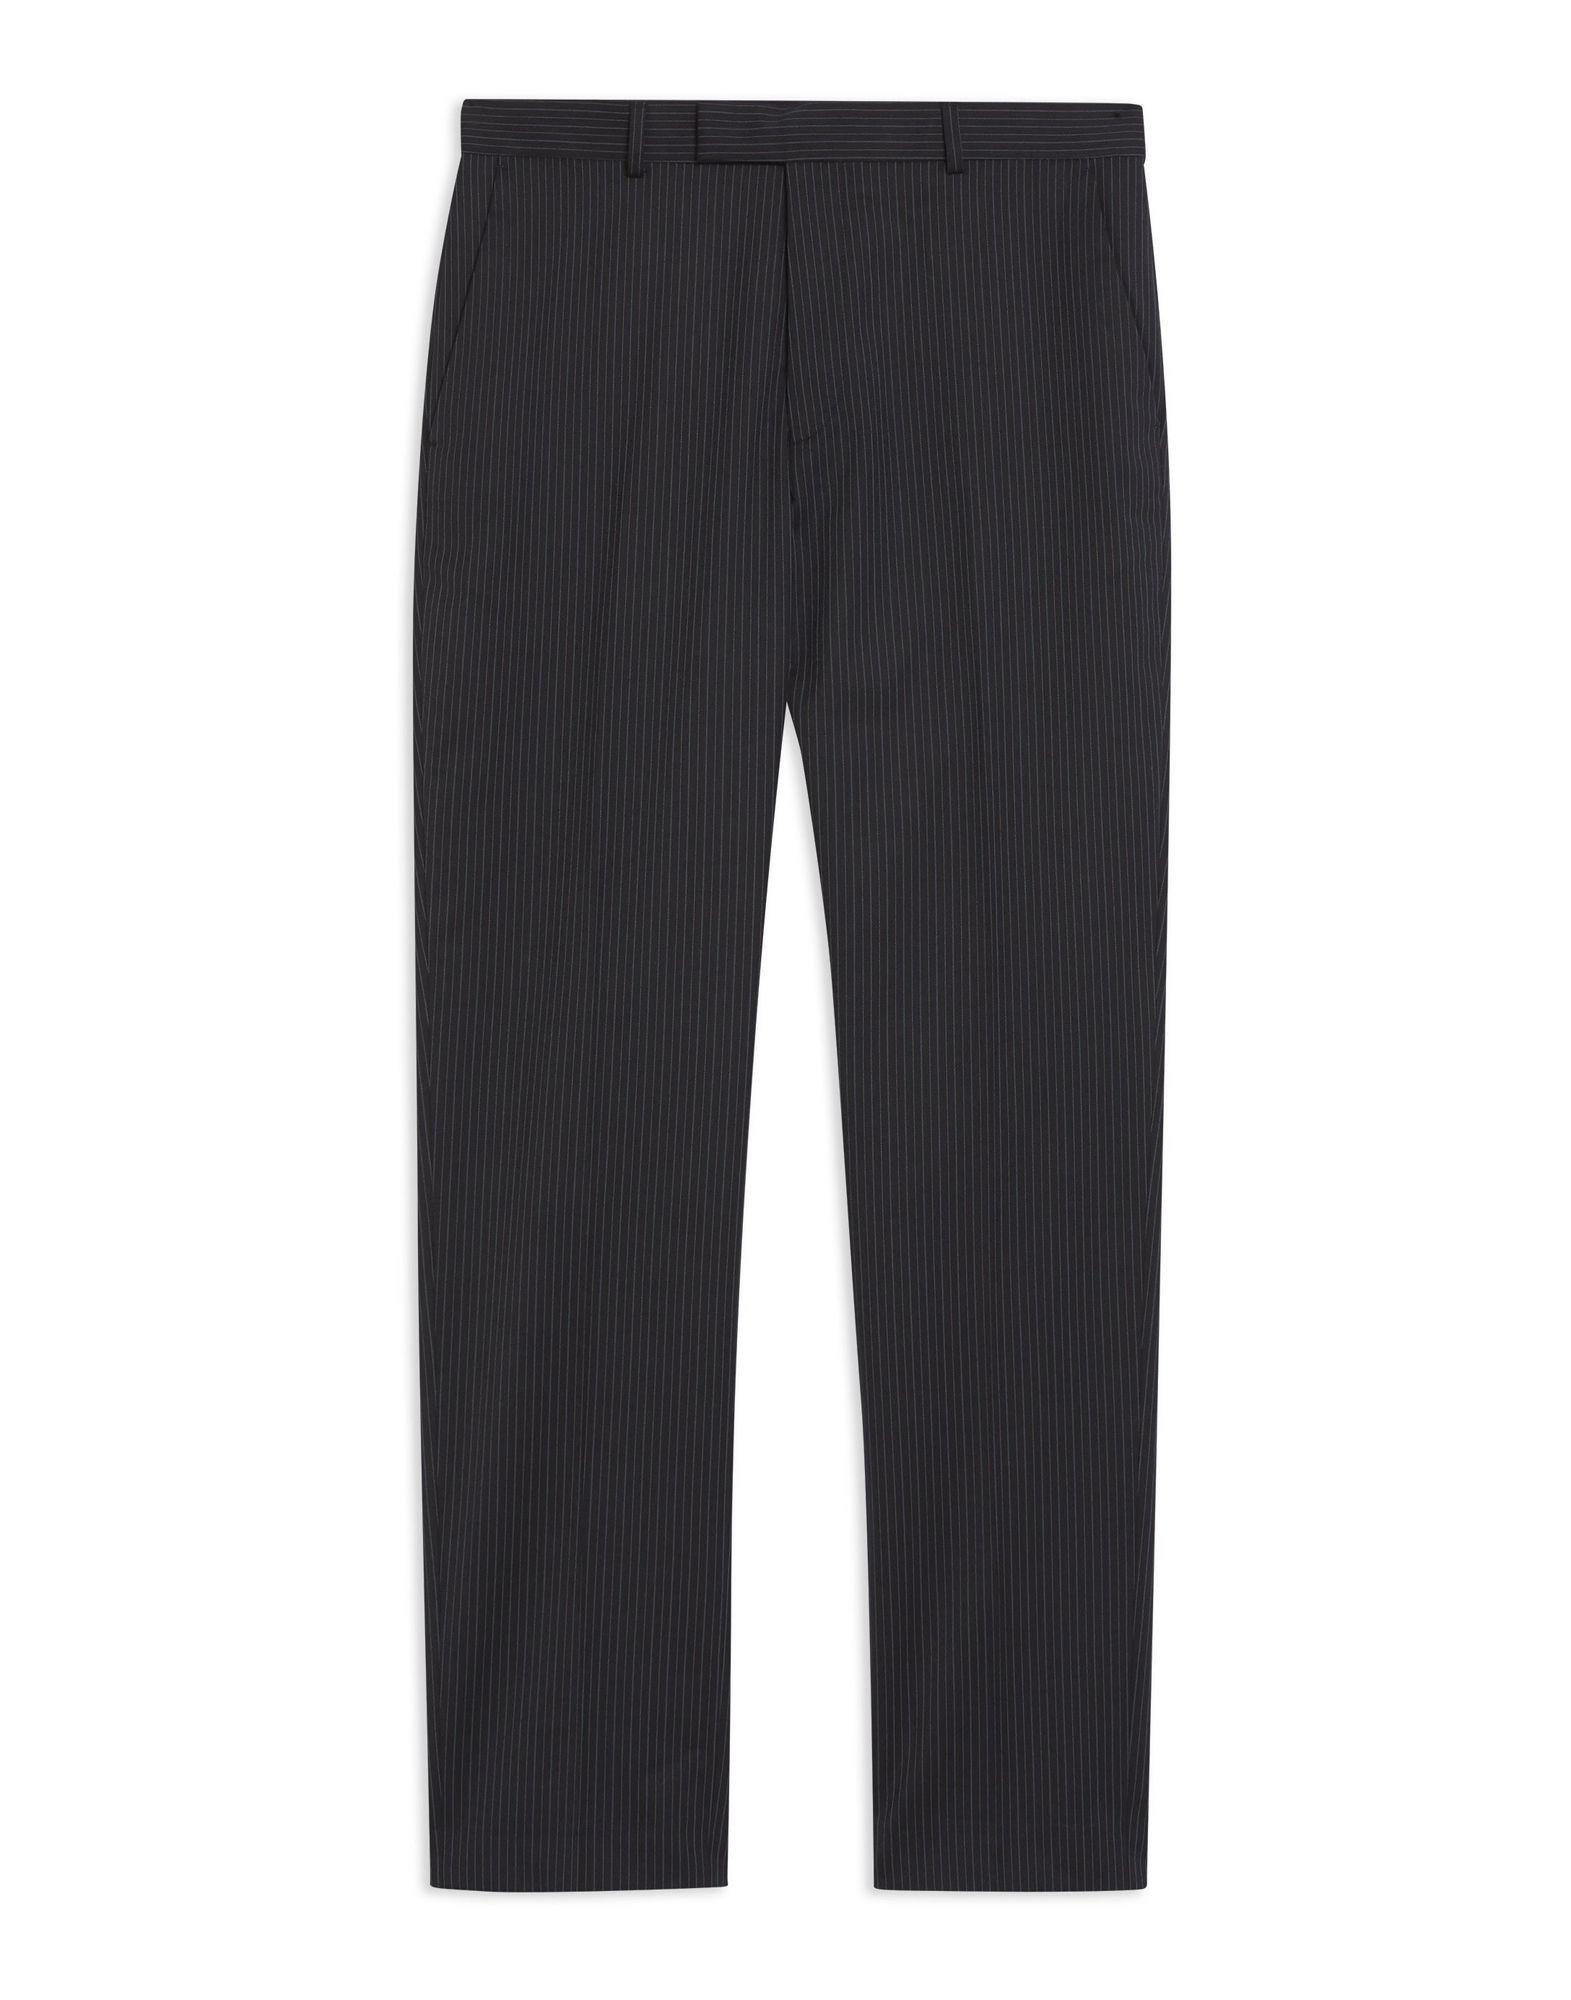 Pantalone Topman Premium Navy Pinstripe Slim Trousers - herren - 13359435FJ